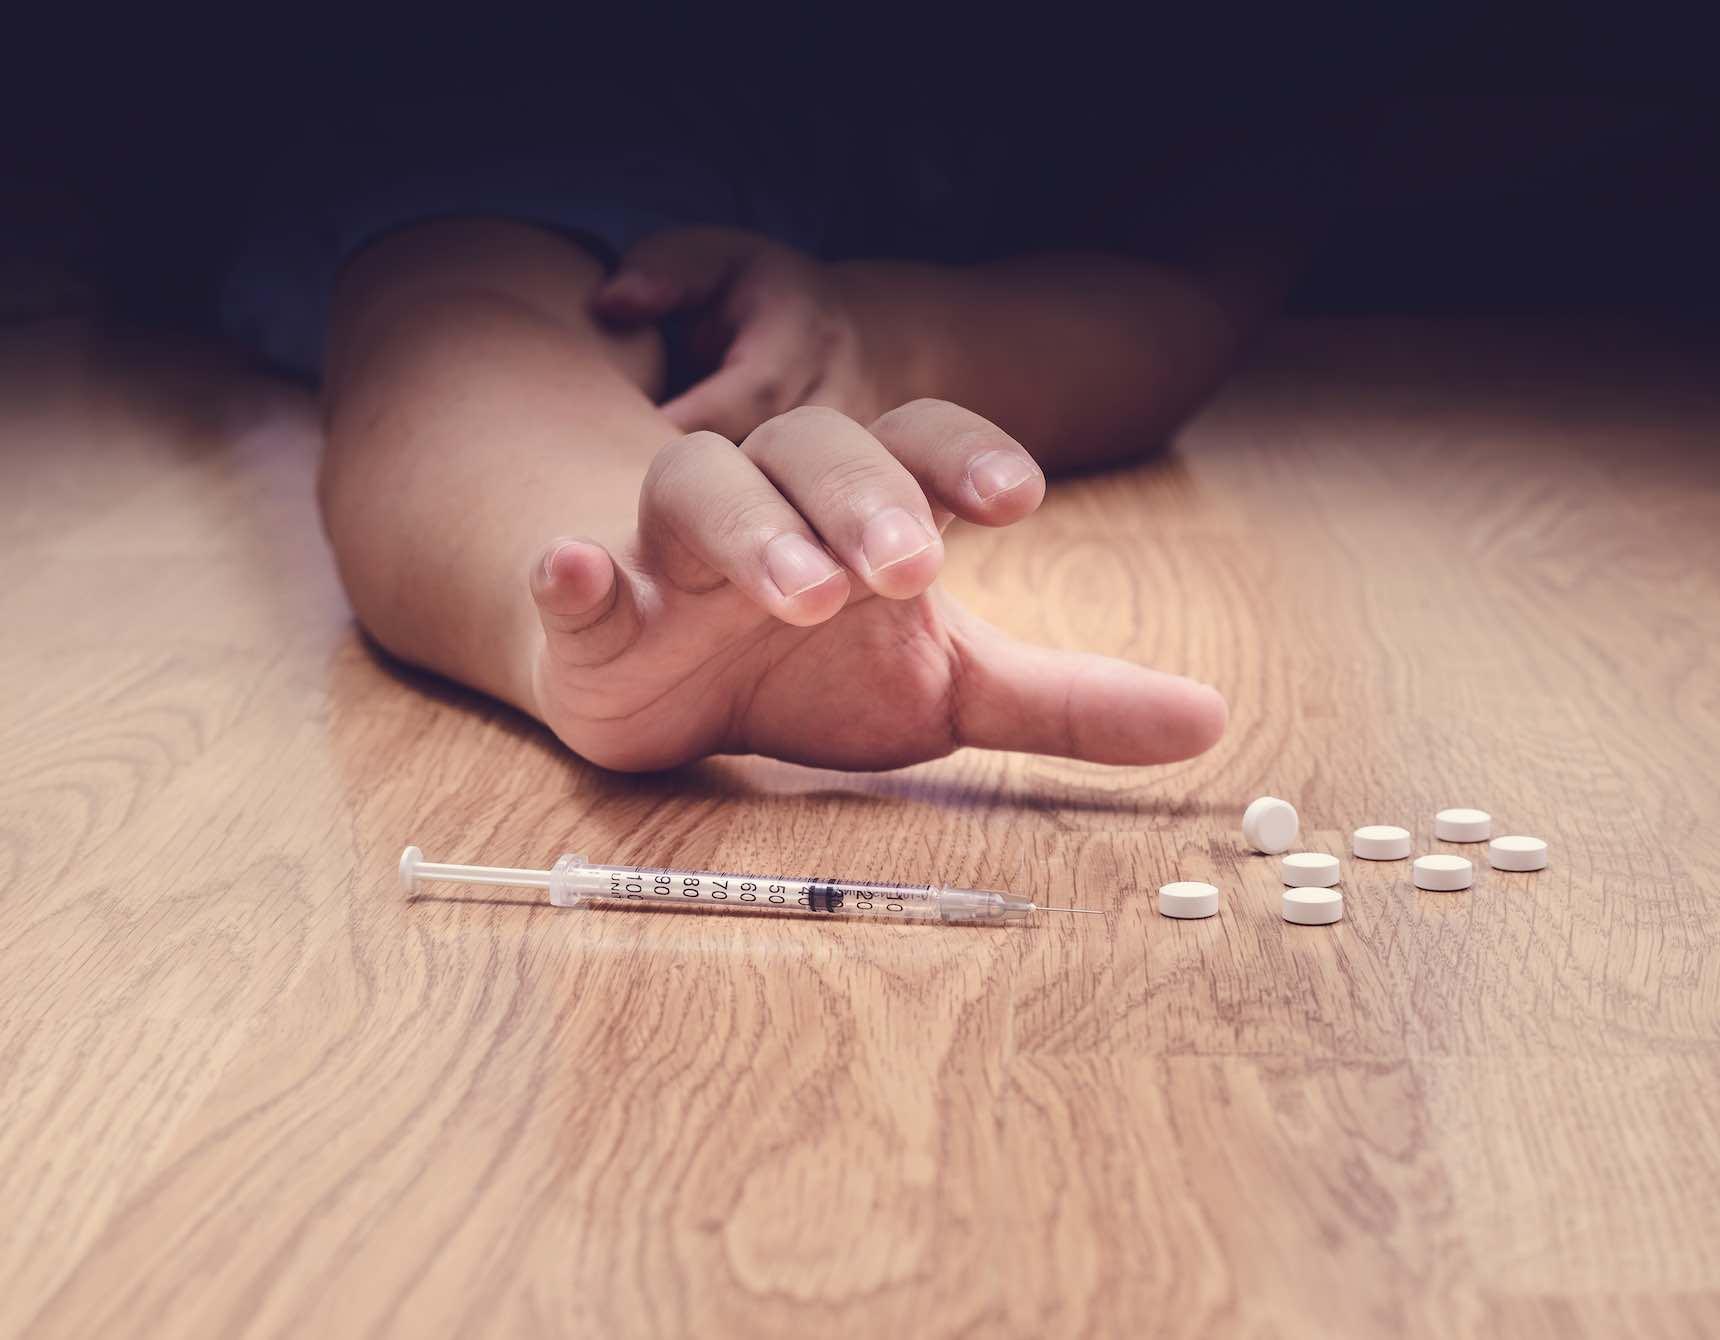 Methadone Treatment Etobicoke